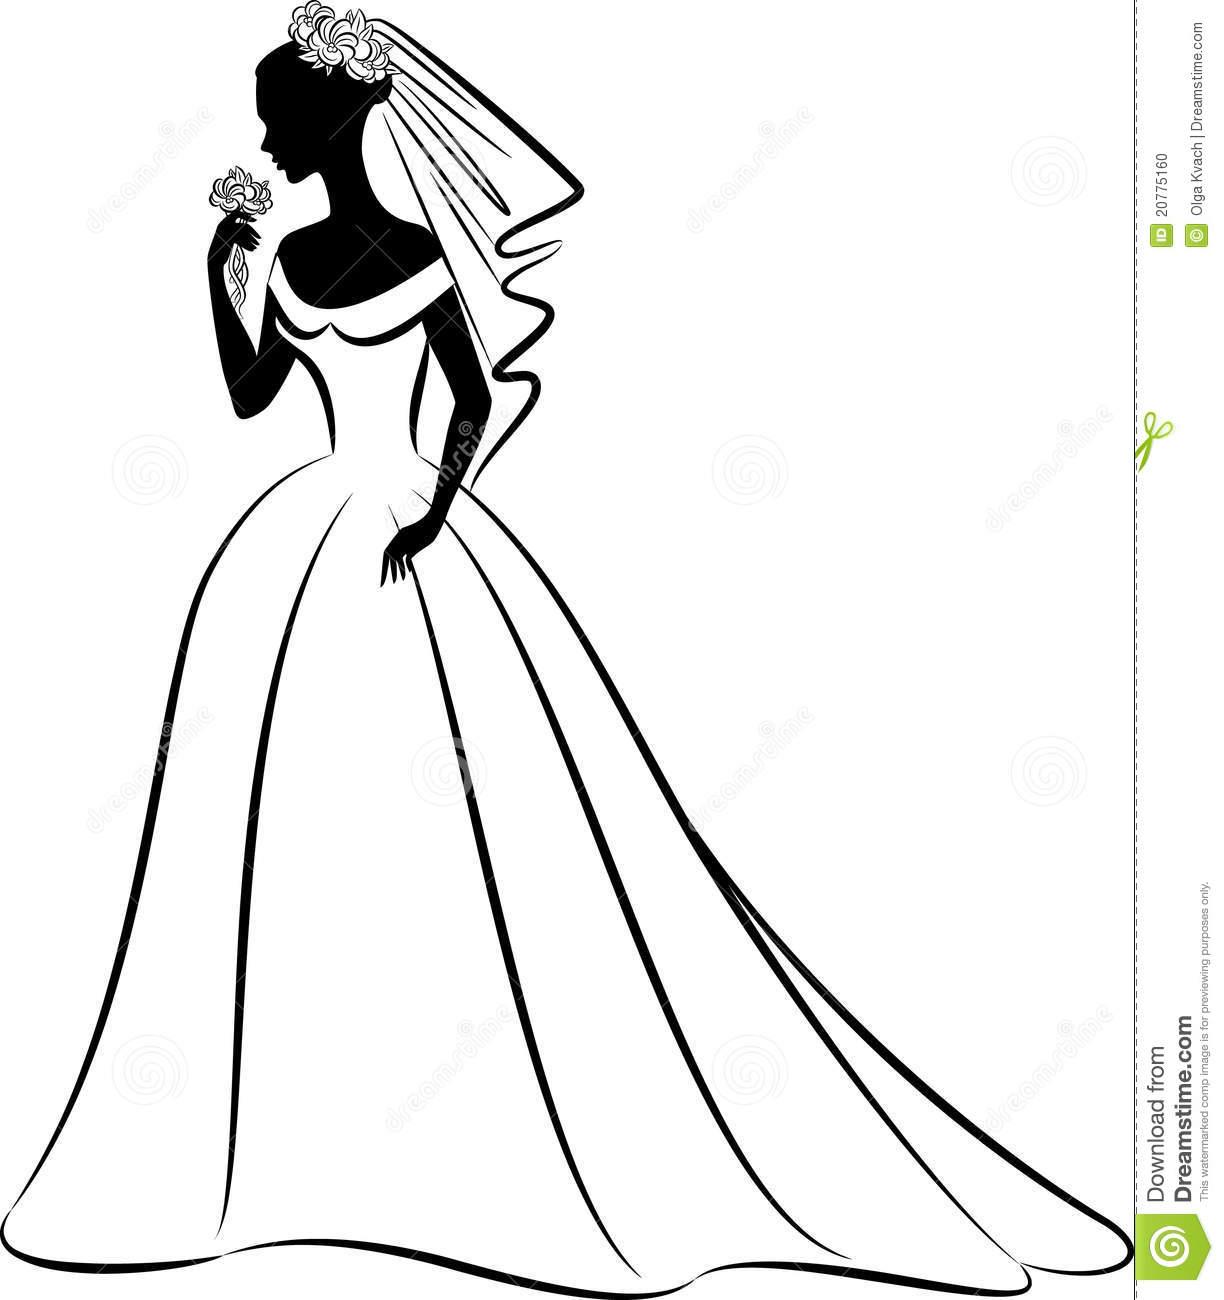 hight resolution of 1224x1300 wedding clip art wedding clipart wedding dress clipart